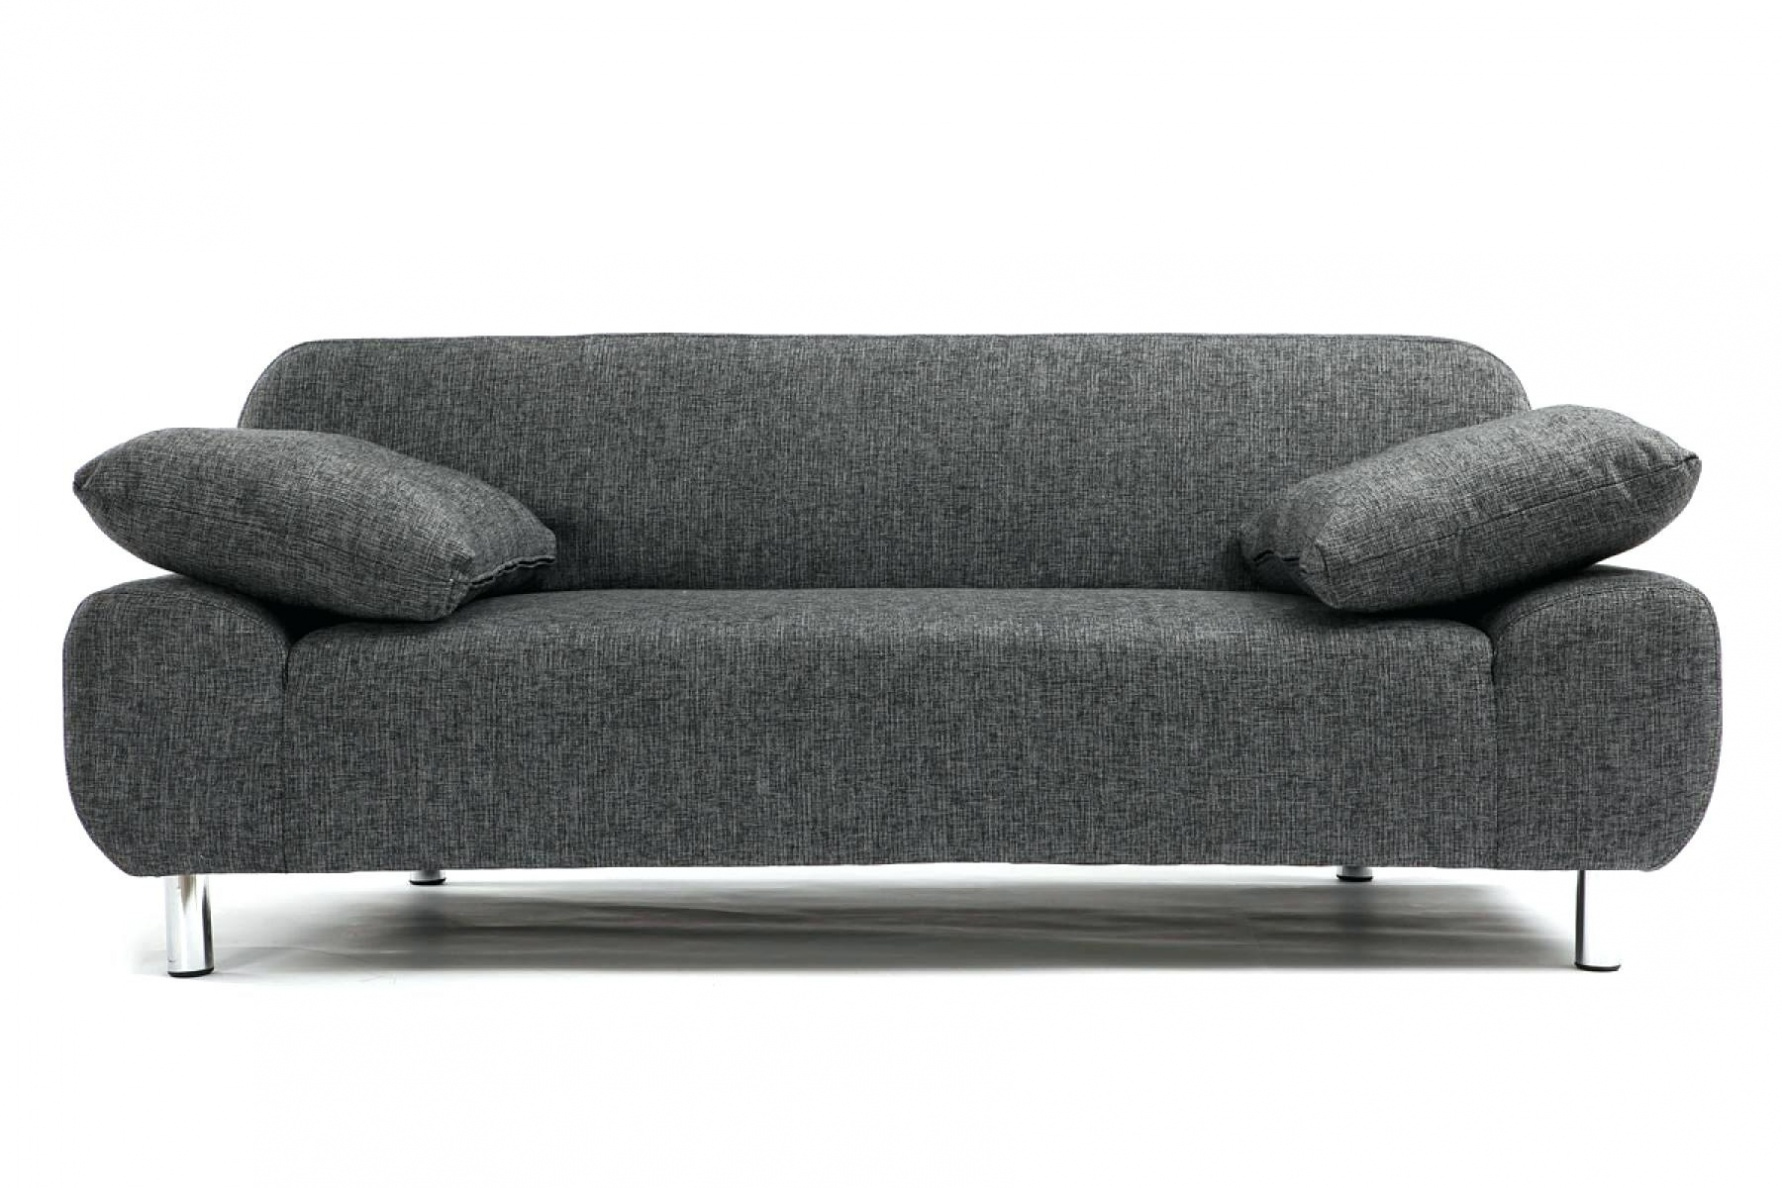 Jeté De Fauteuil Ikea Meilleur De Collection Maha S Jeté De Canapé Gris Home Mahagranda